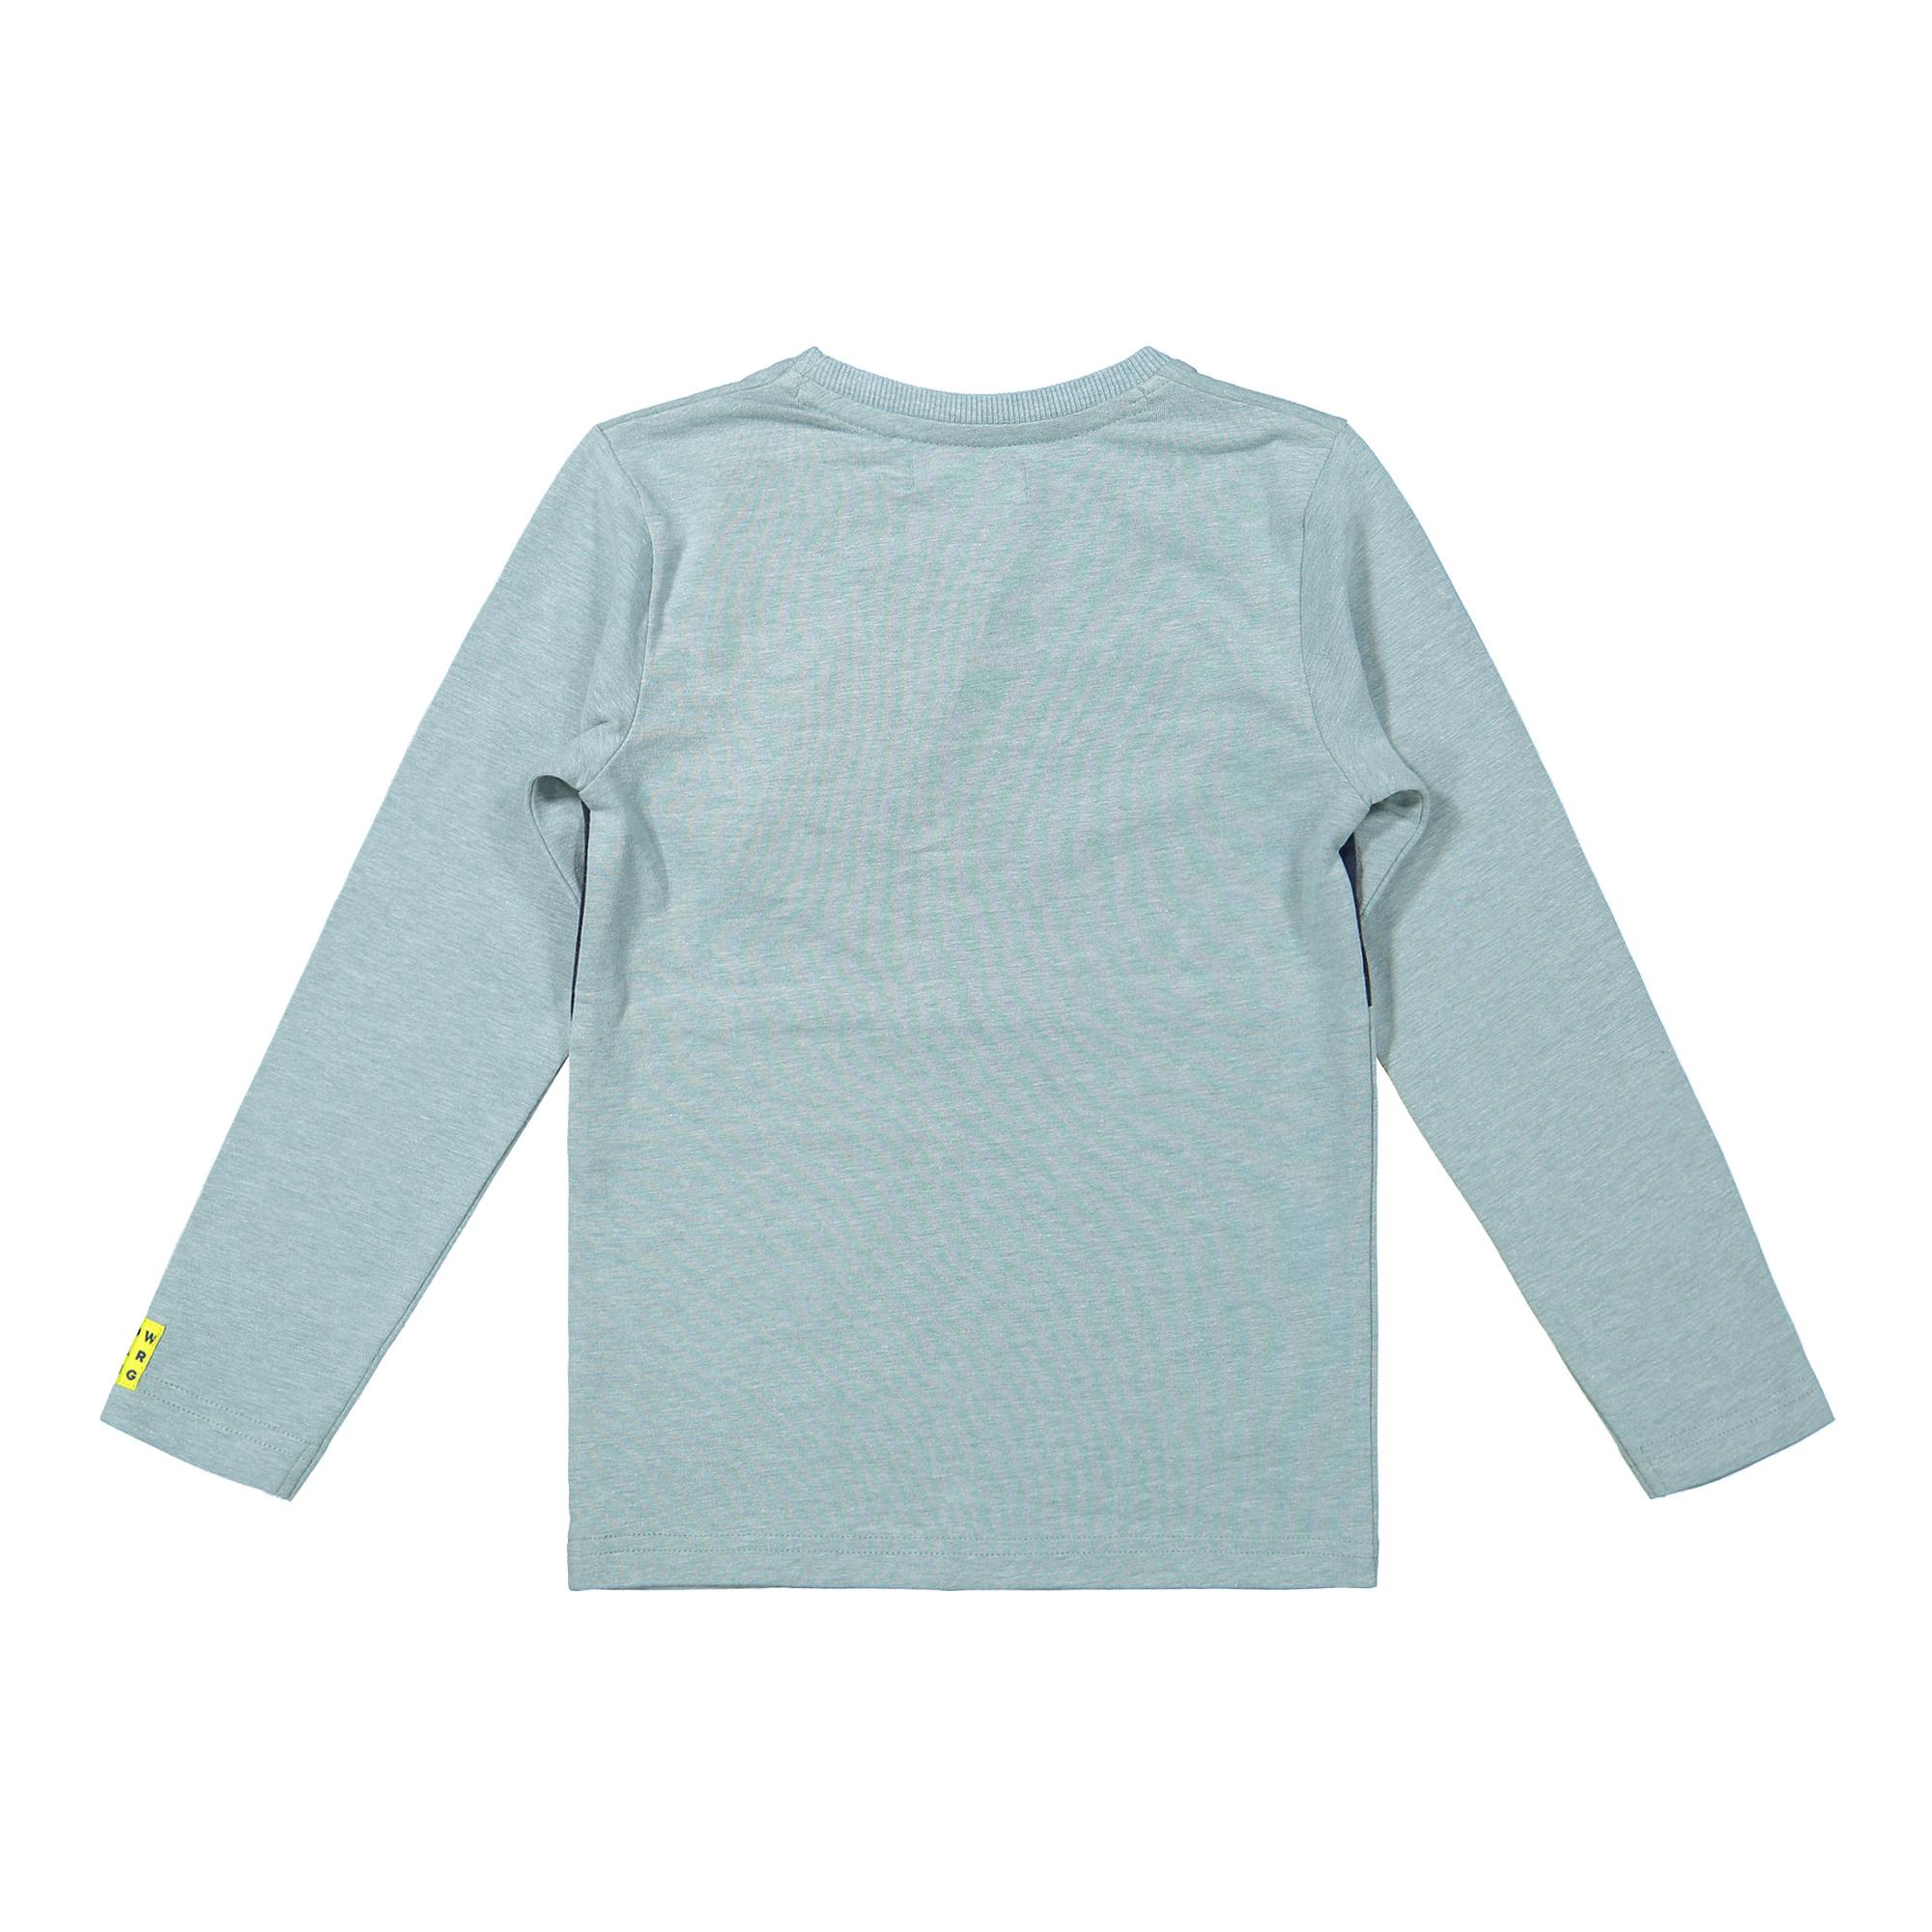 FreeStyle Long Sleeved Shirt